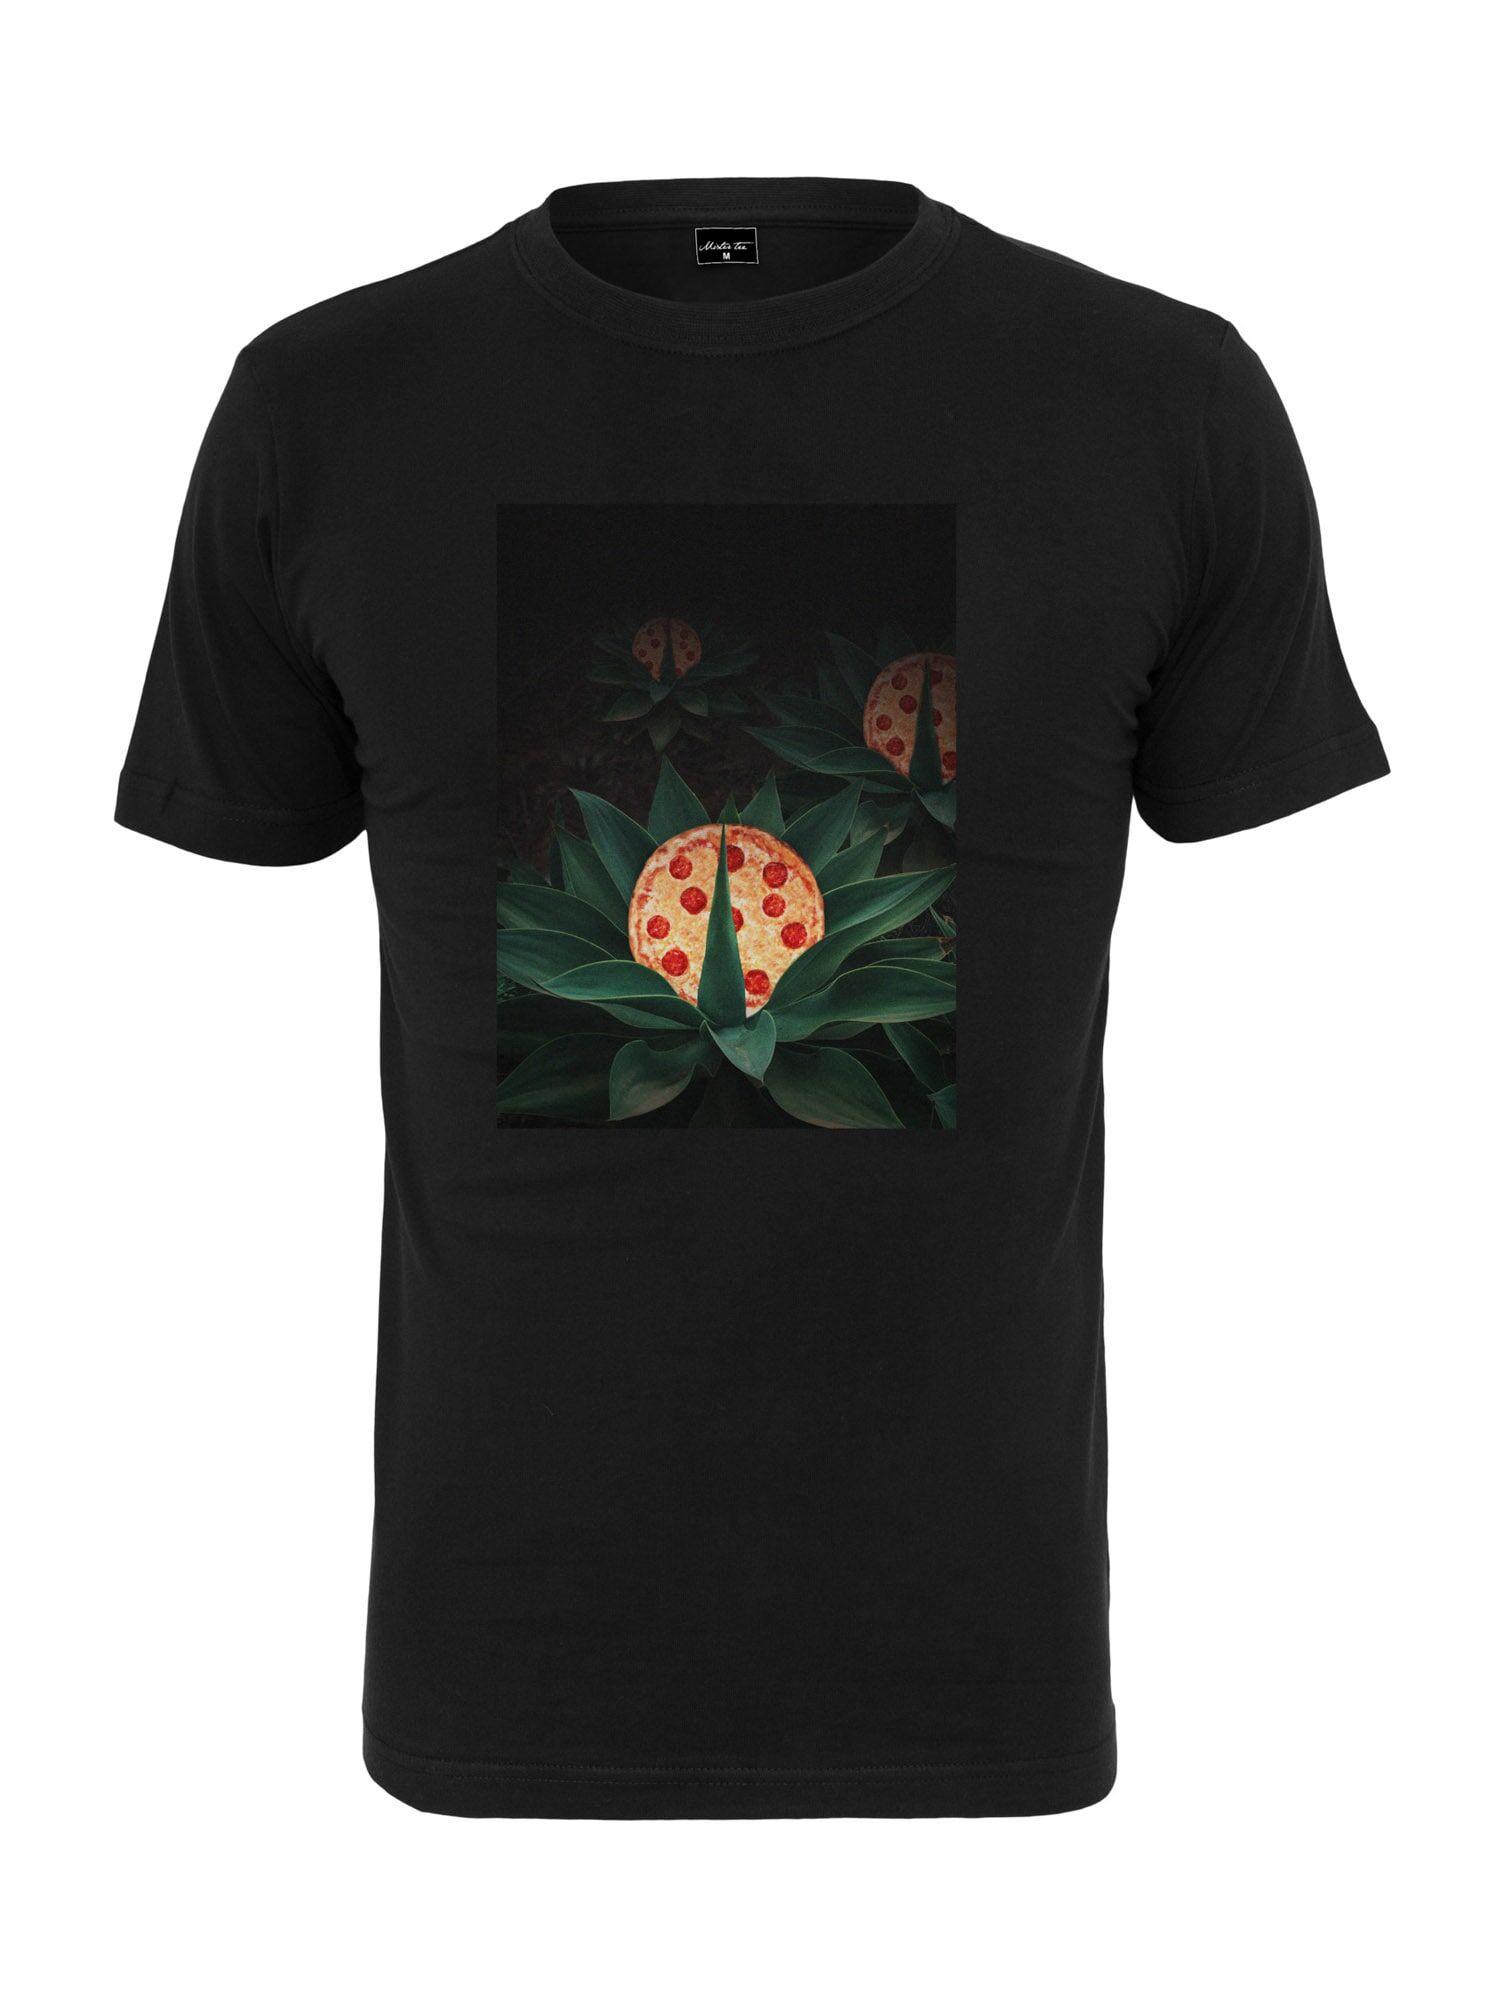 Tee T-Shirt 'Pizza Plant'  - Noir - Taille: XL - male